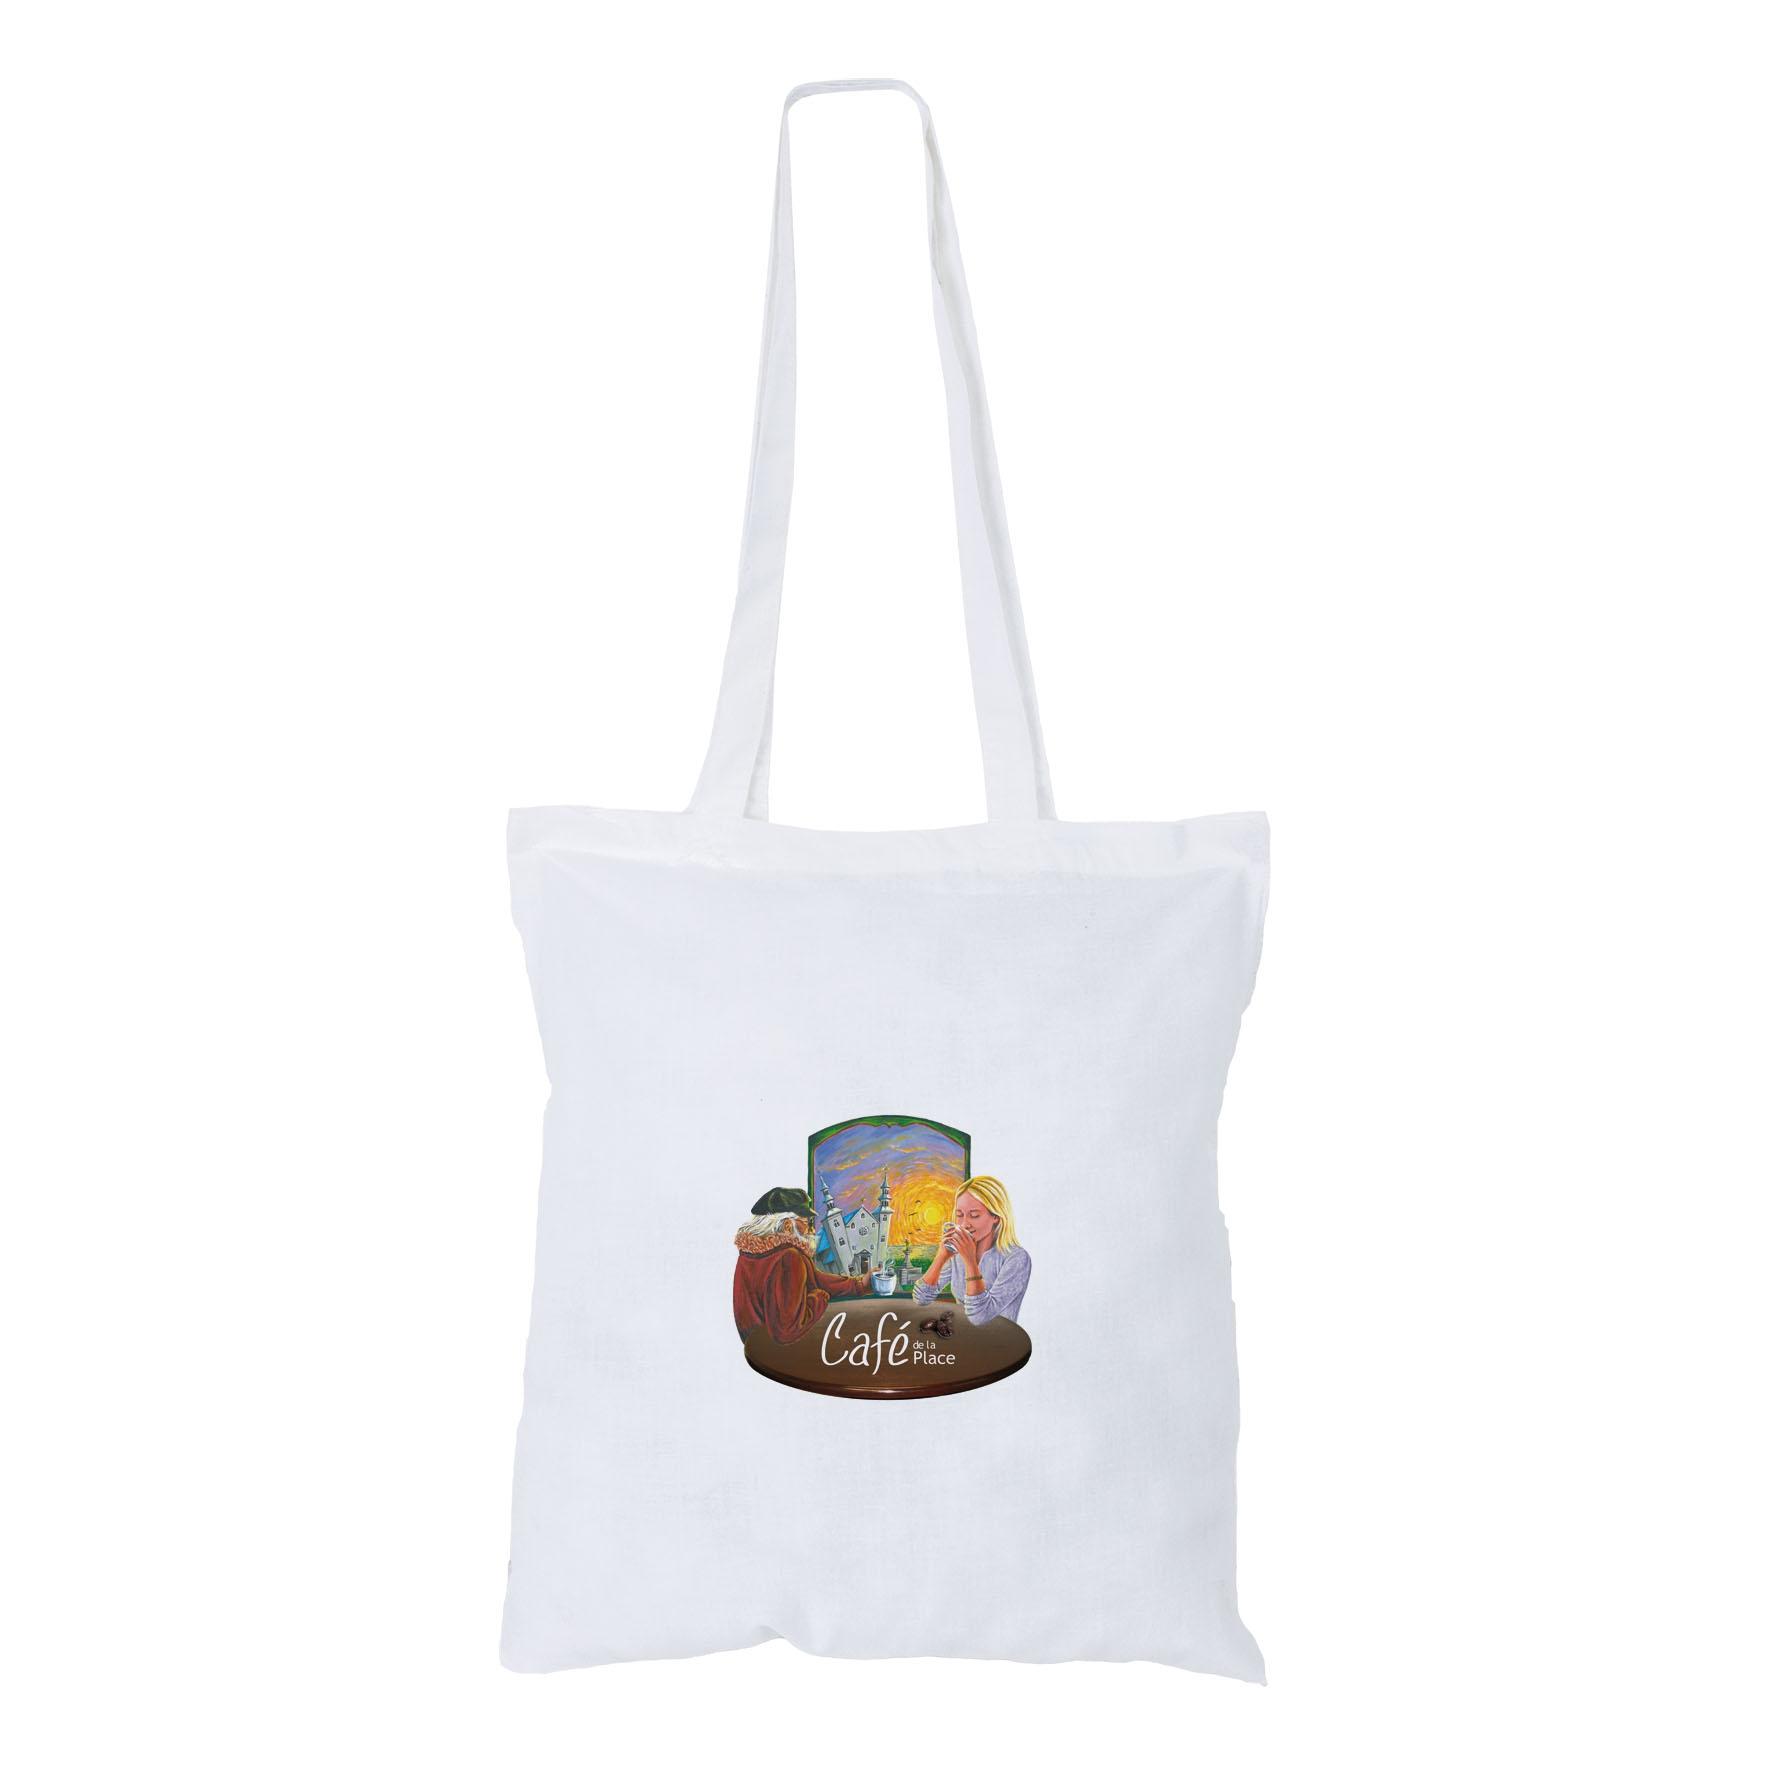 Sac shopping publicitaire coton Maria - sac shopping promotionnel